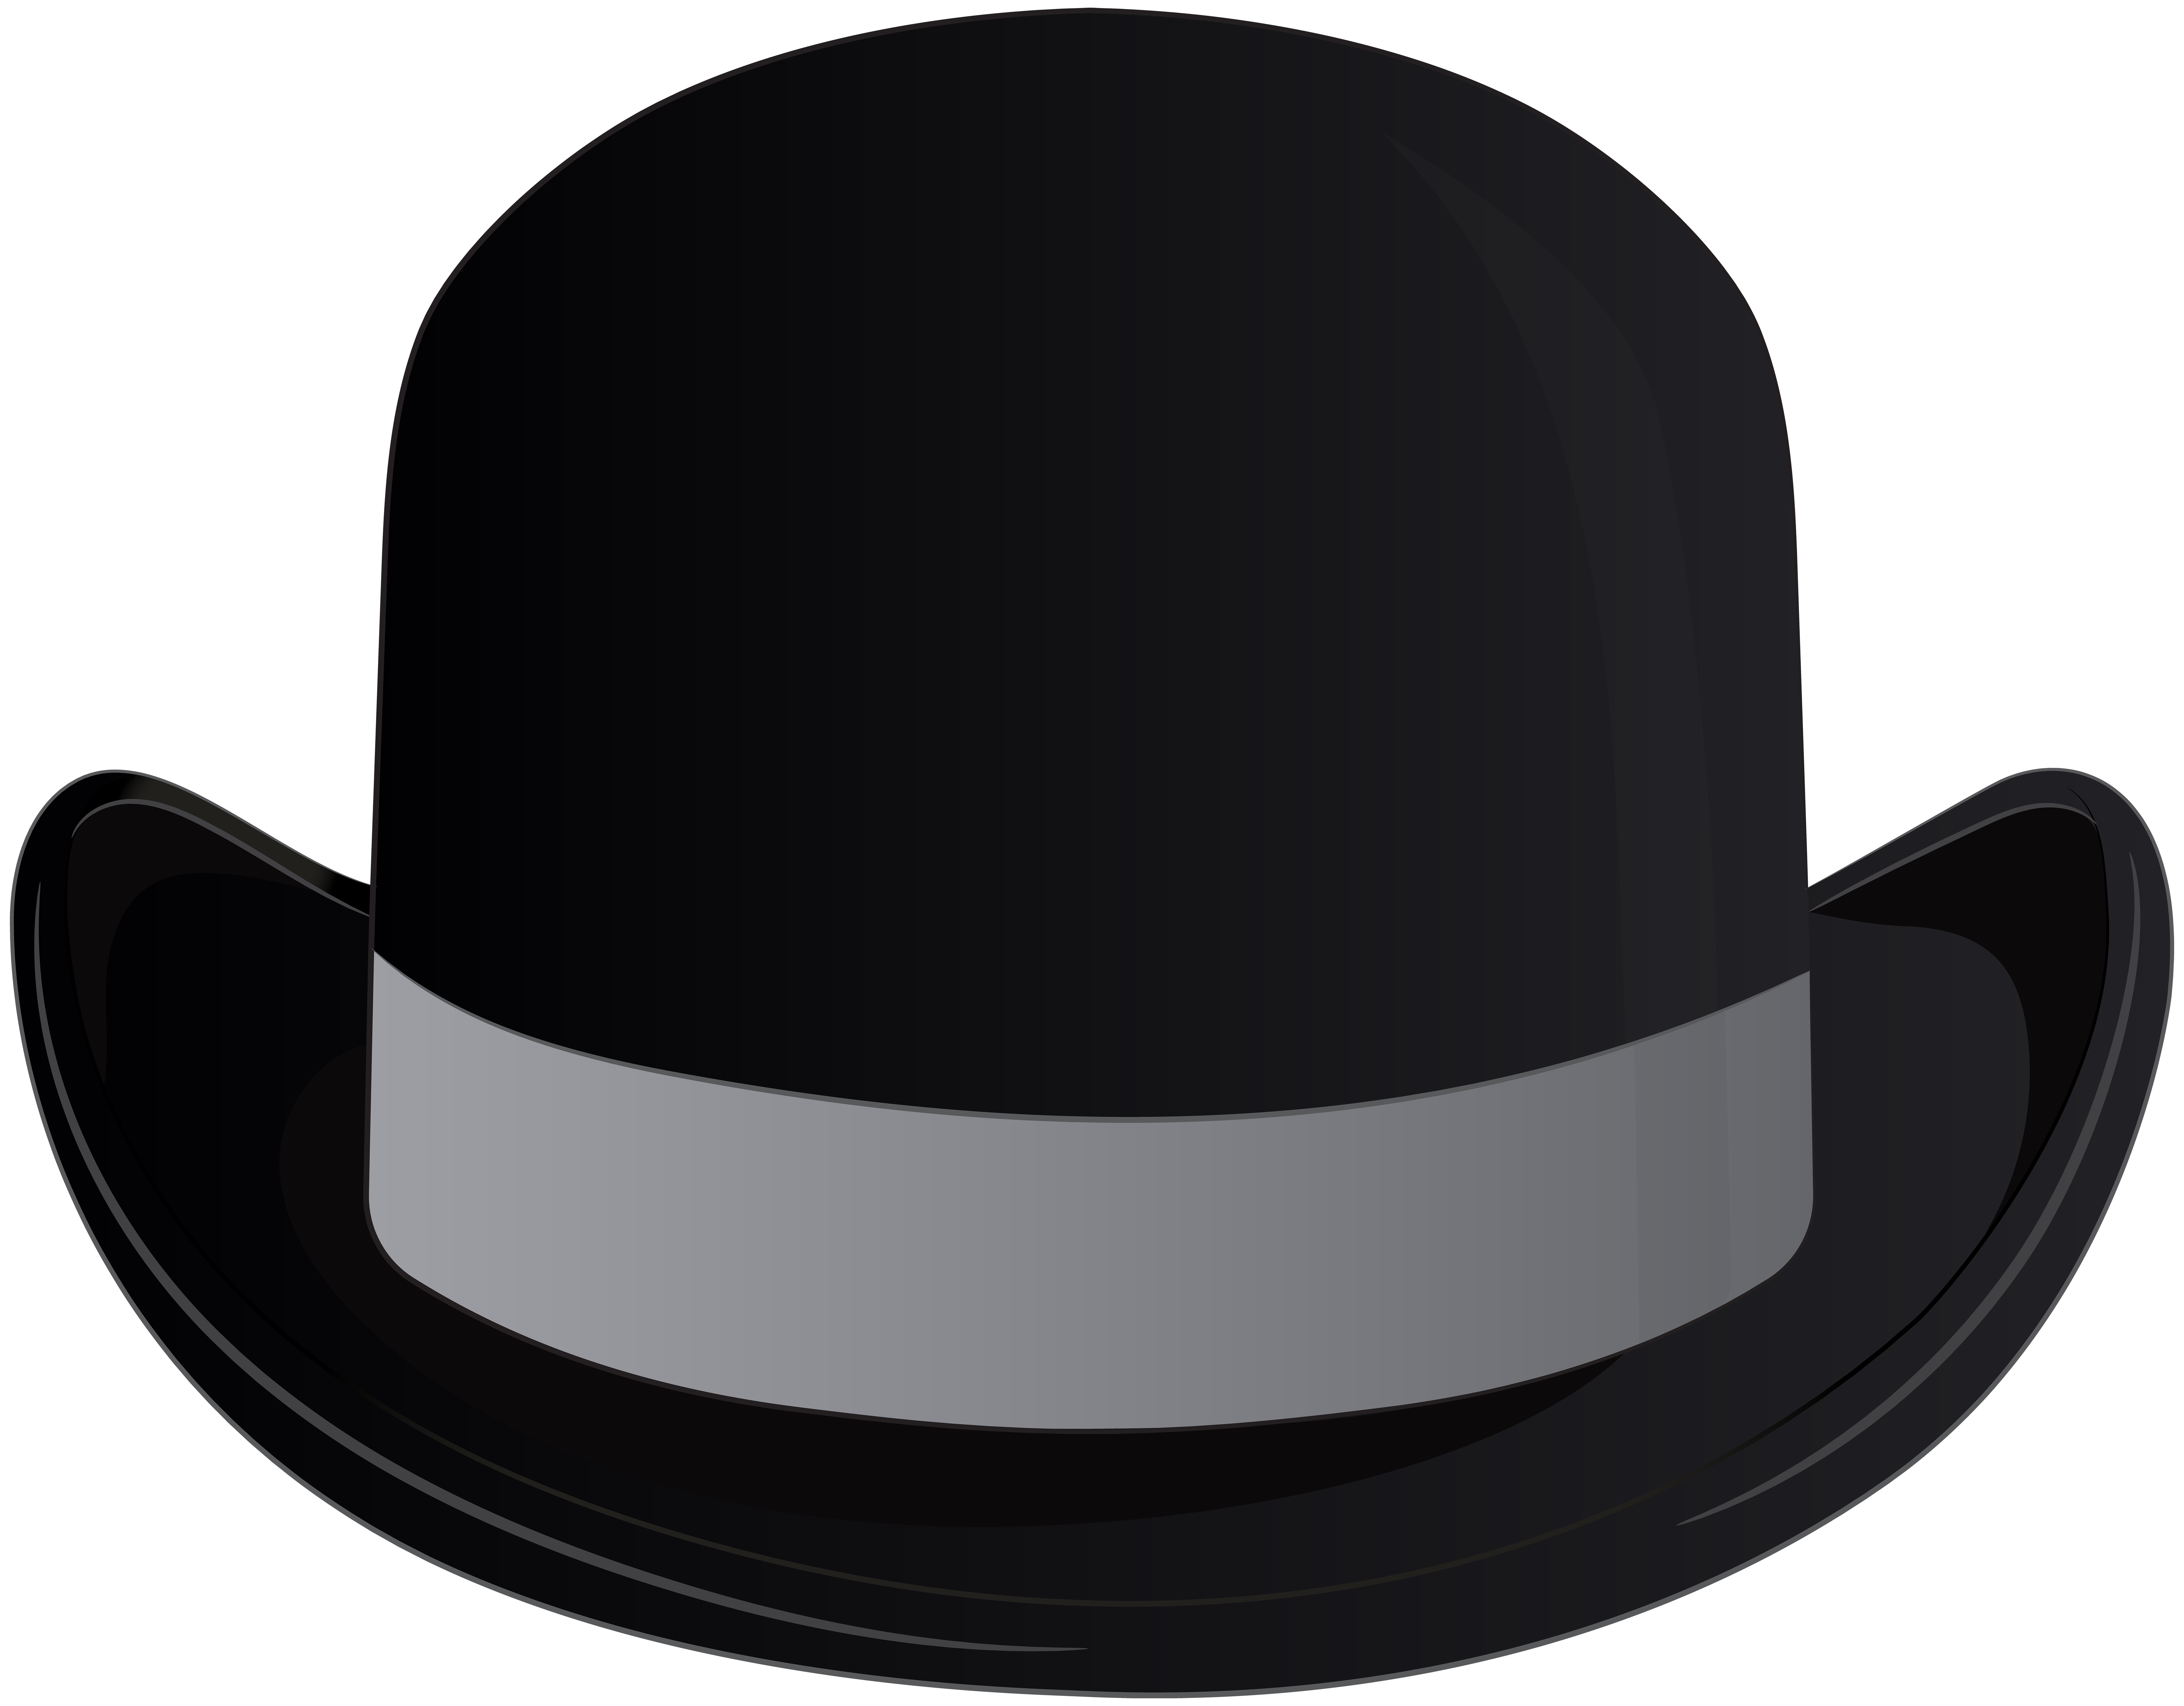 8000x6248 Bowler Hat Transparent Clip Art Png Imageu200b Gallery Yopriceville